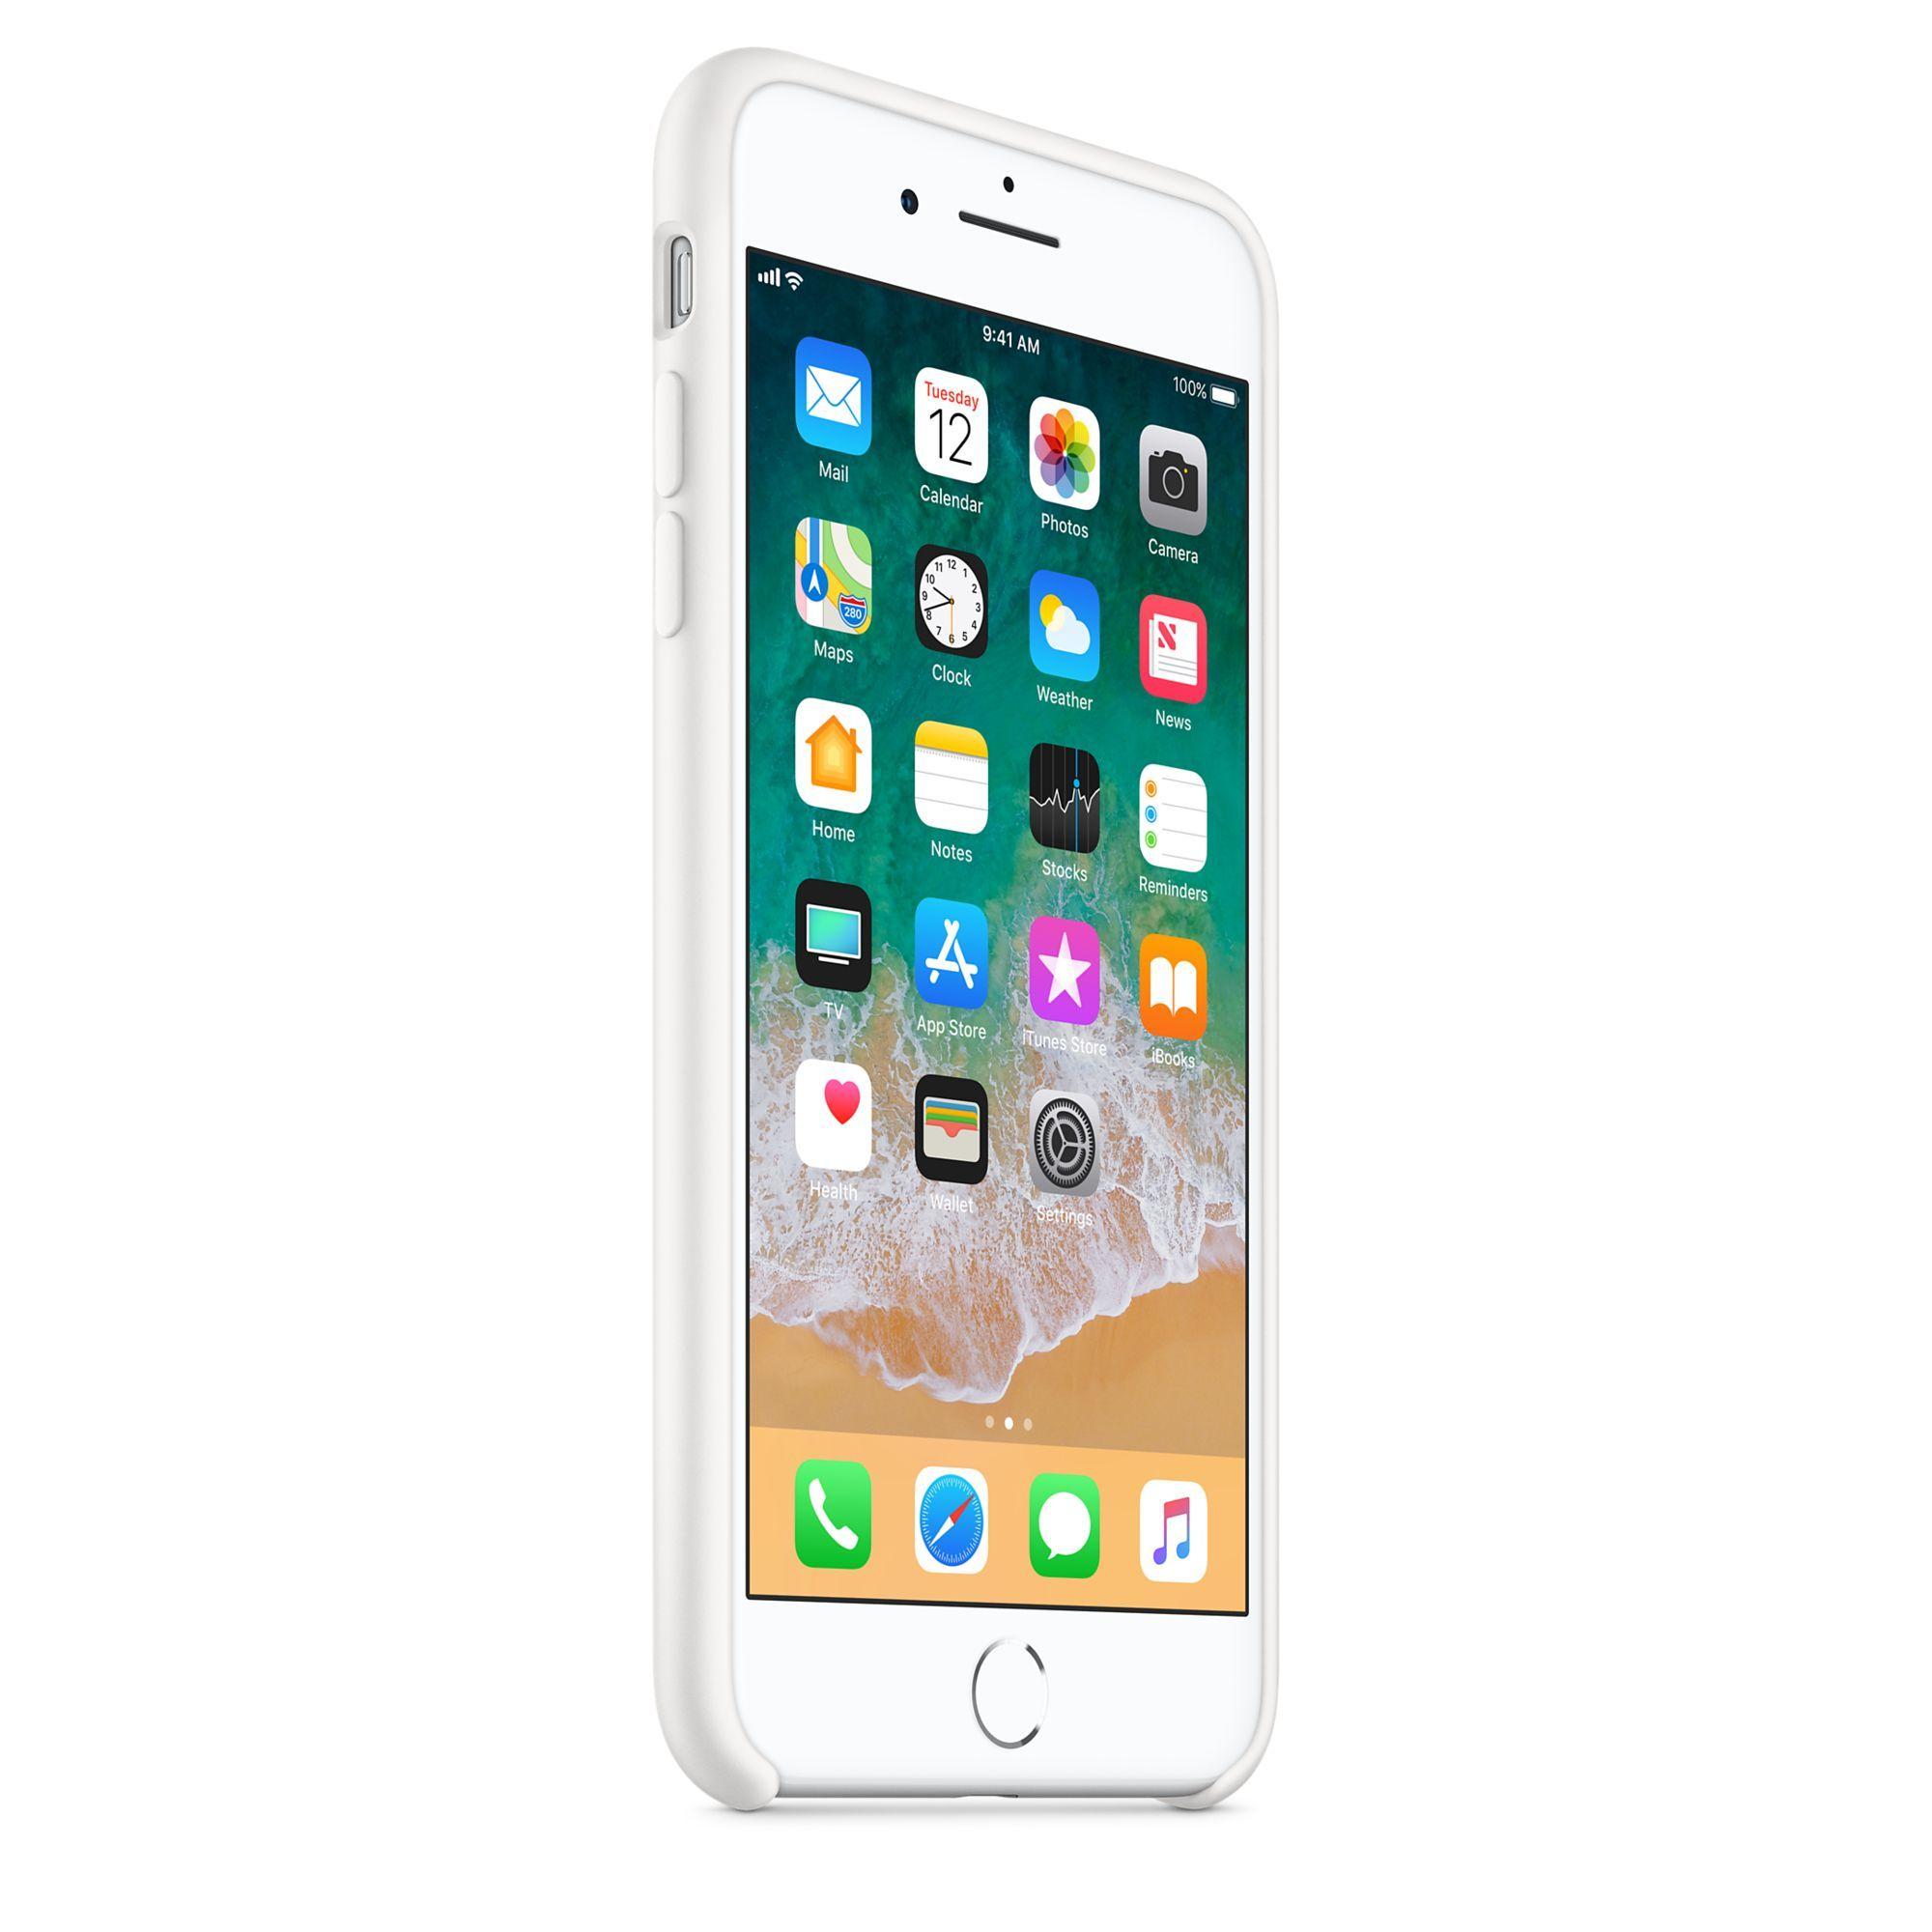 Apple silikónový obal pre iPhone 7 Plus / 8 Plus – biely 2